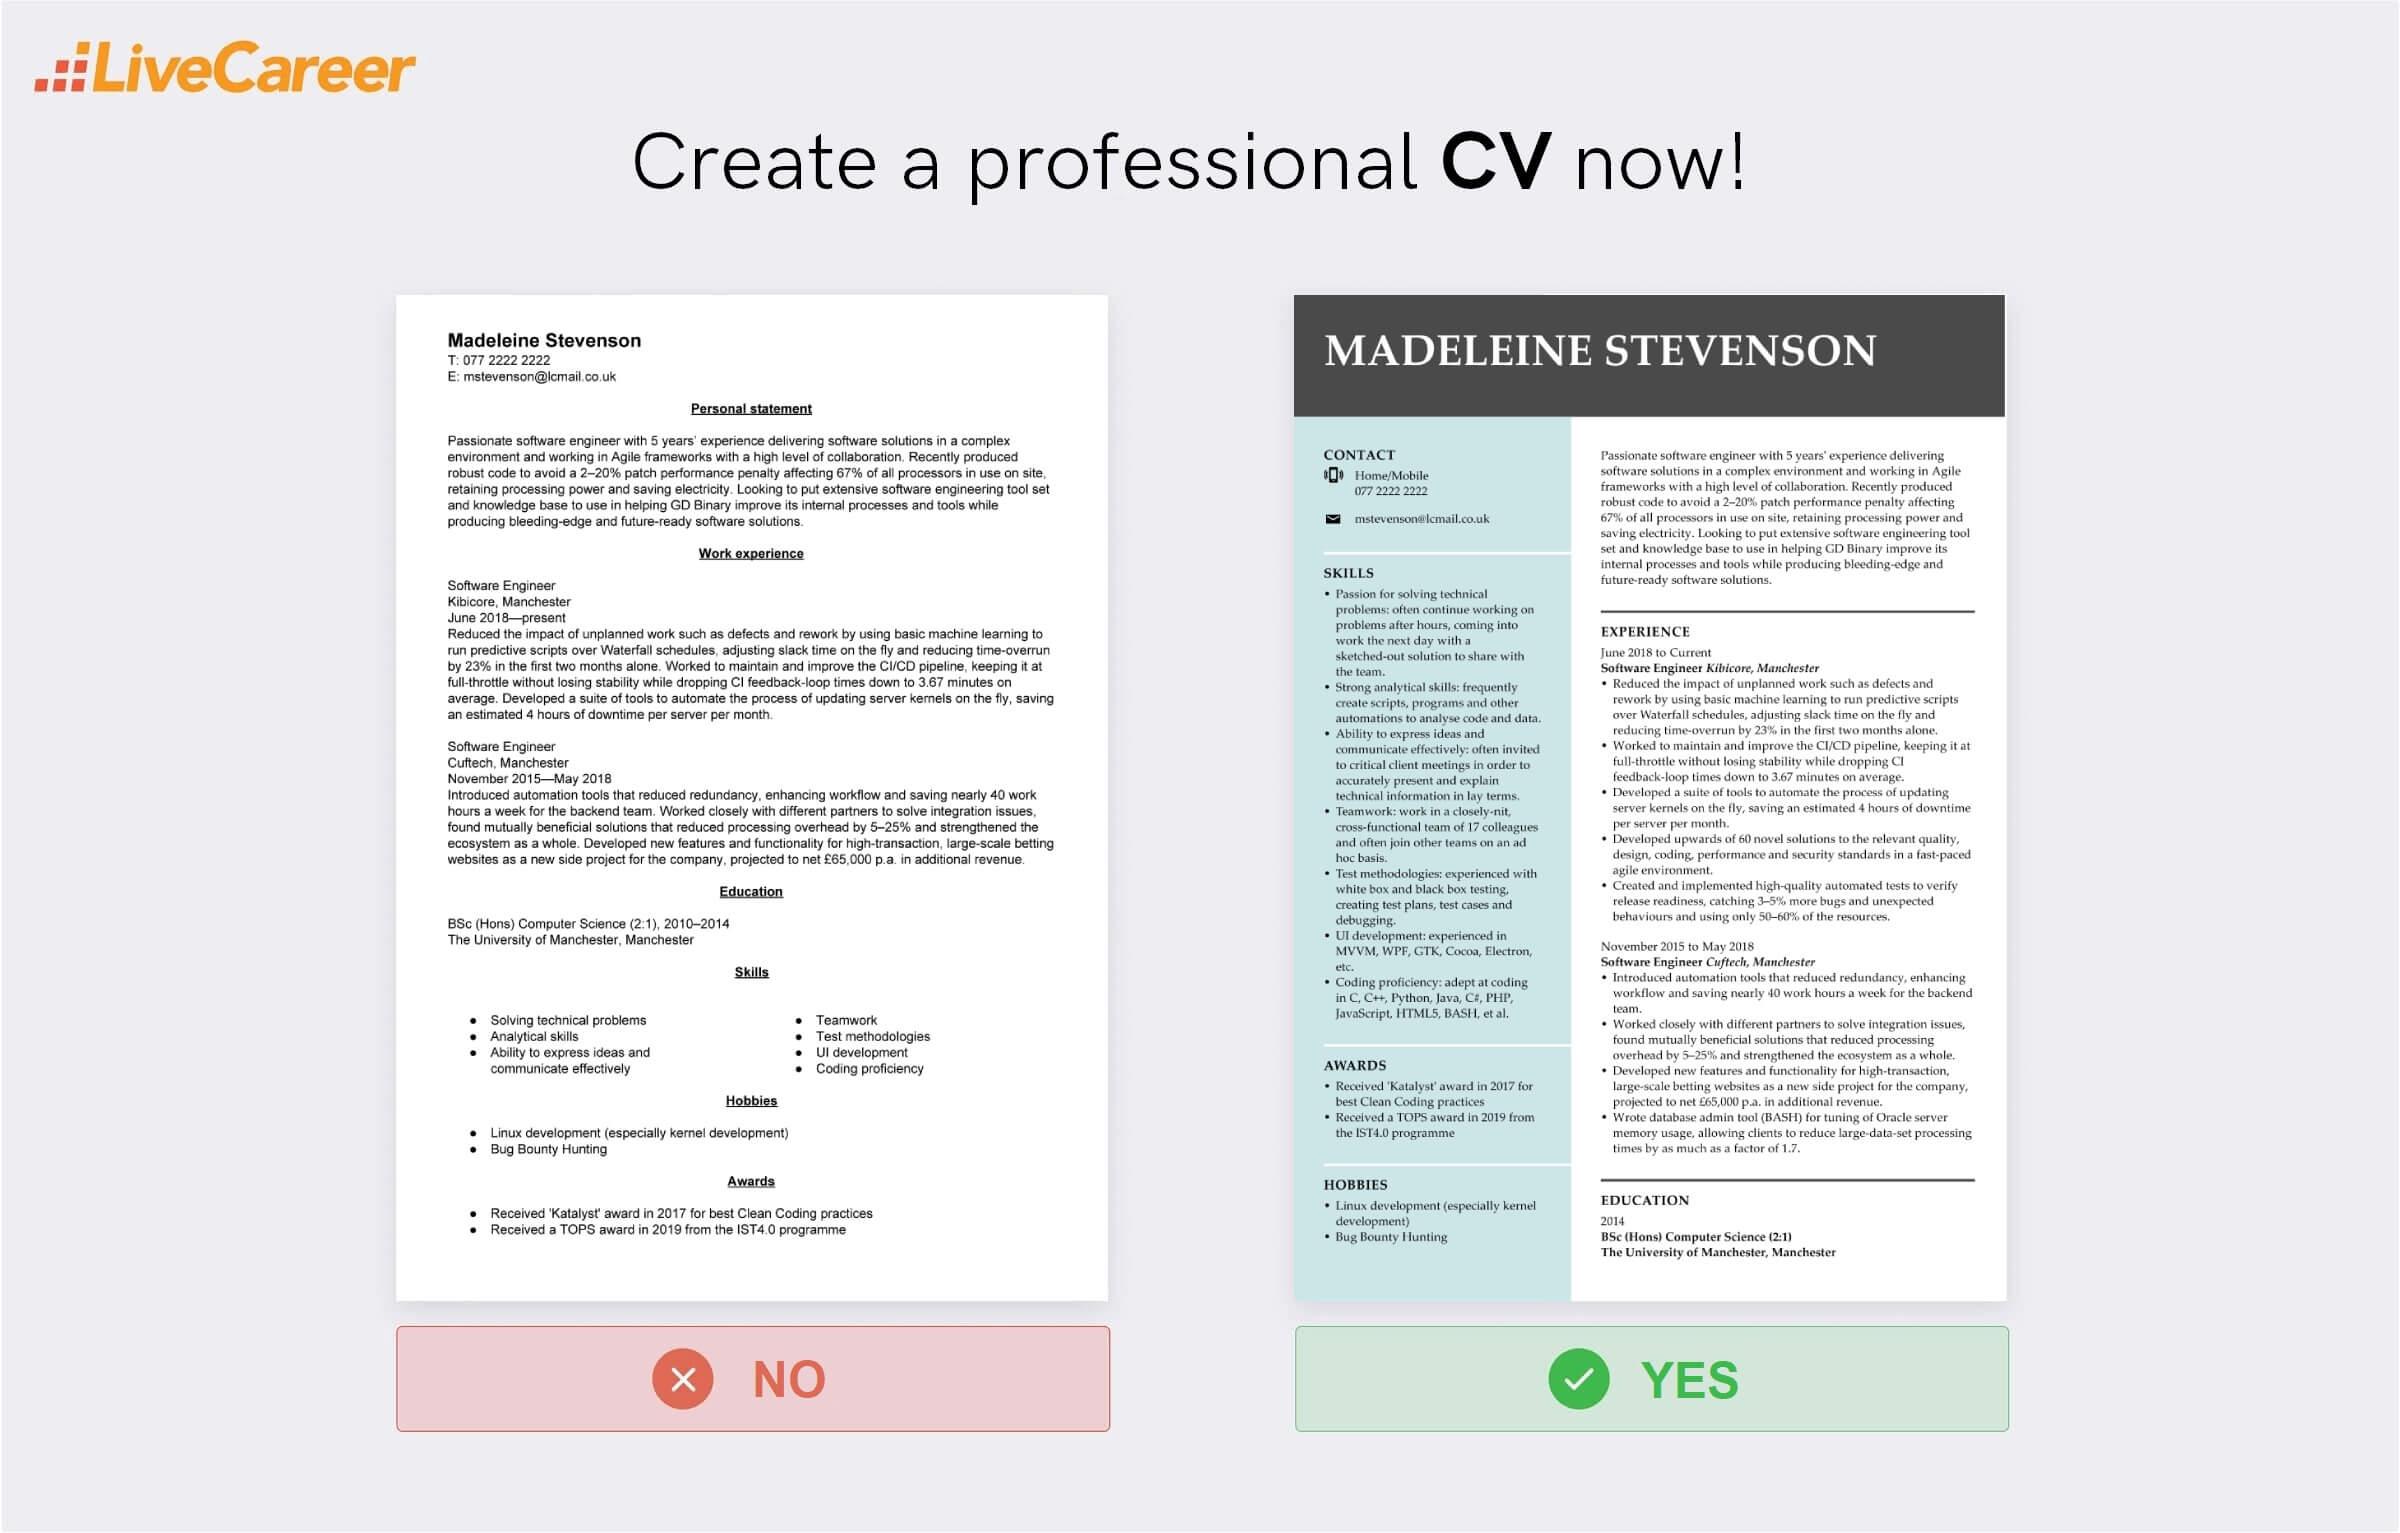 software engineer CV